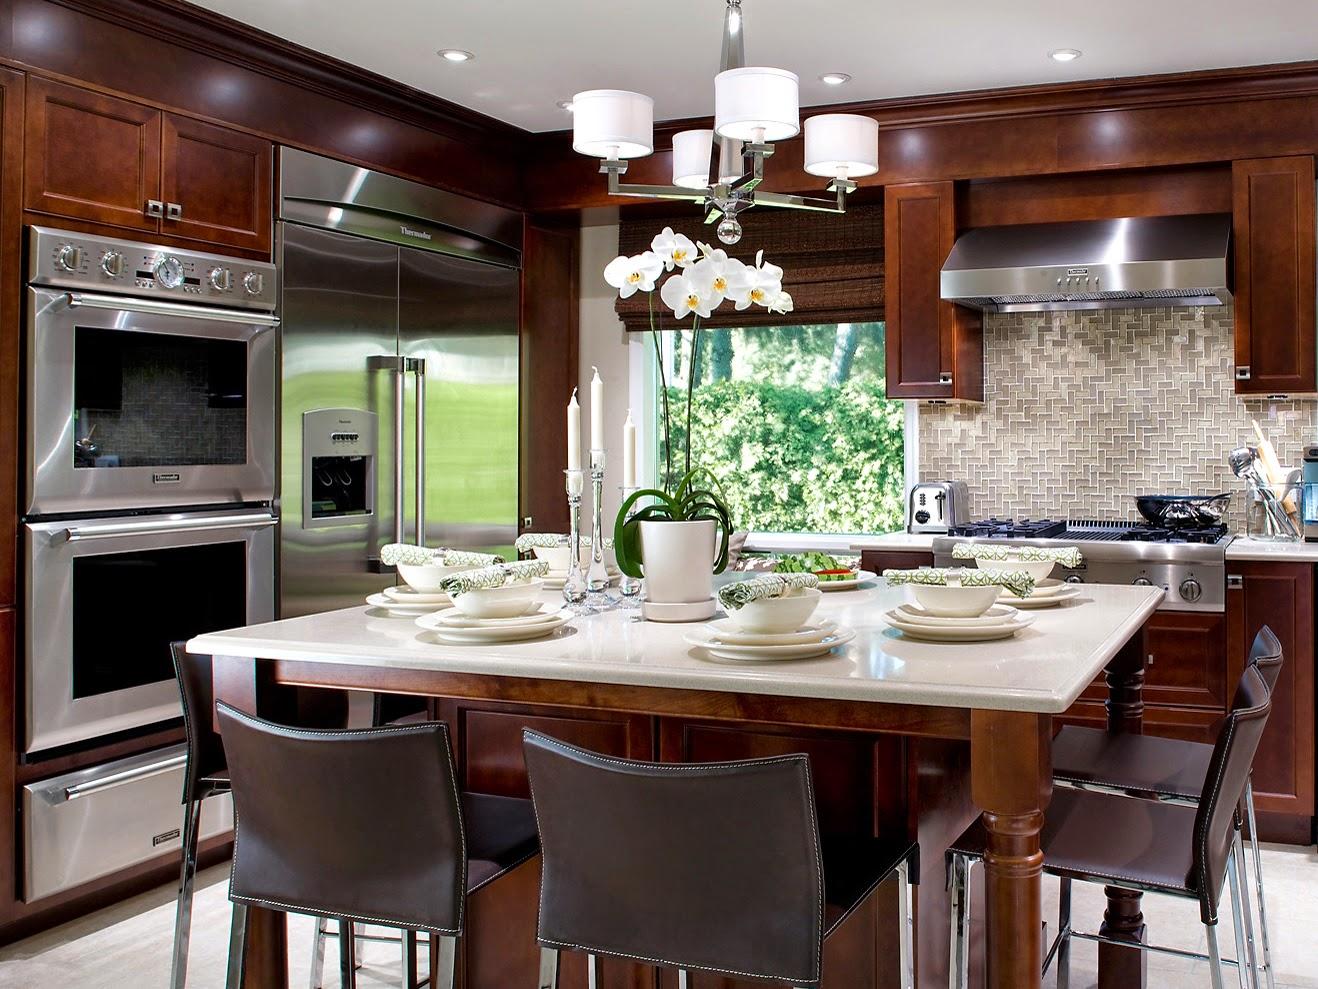 contoh gambar dapur minimalis